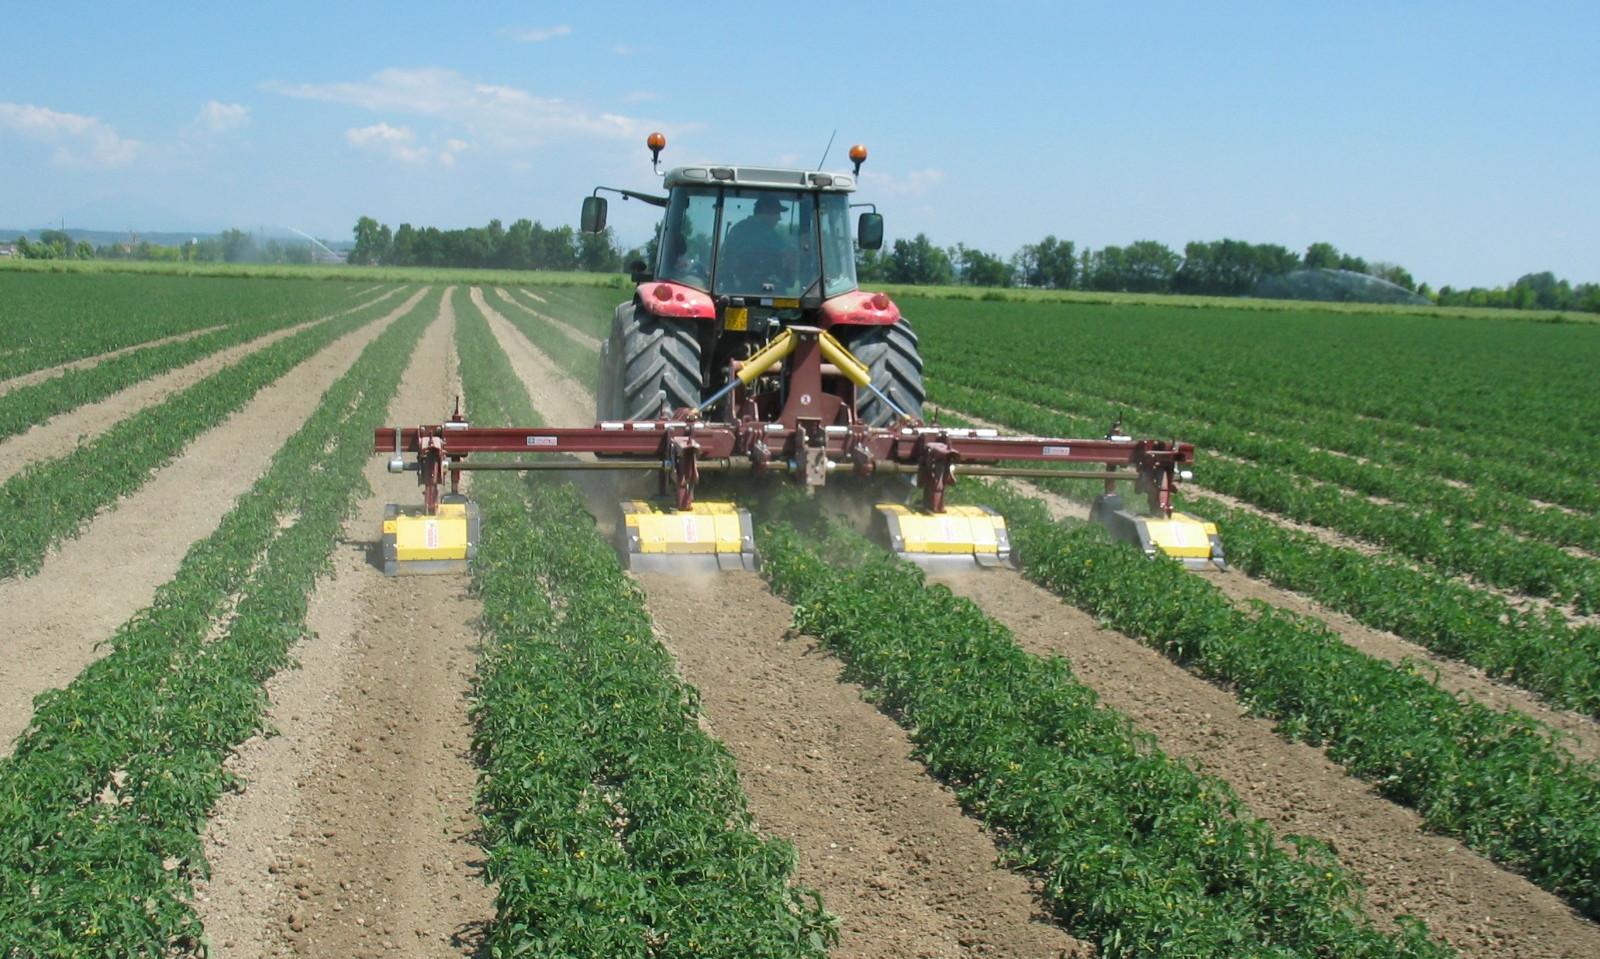 Multirototiller Weed Control Equipment